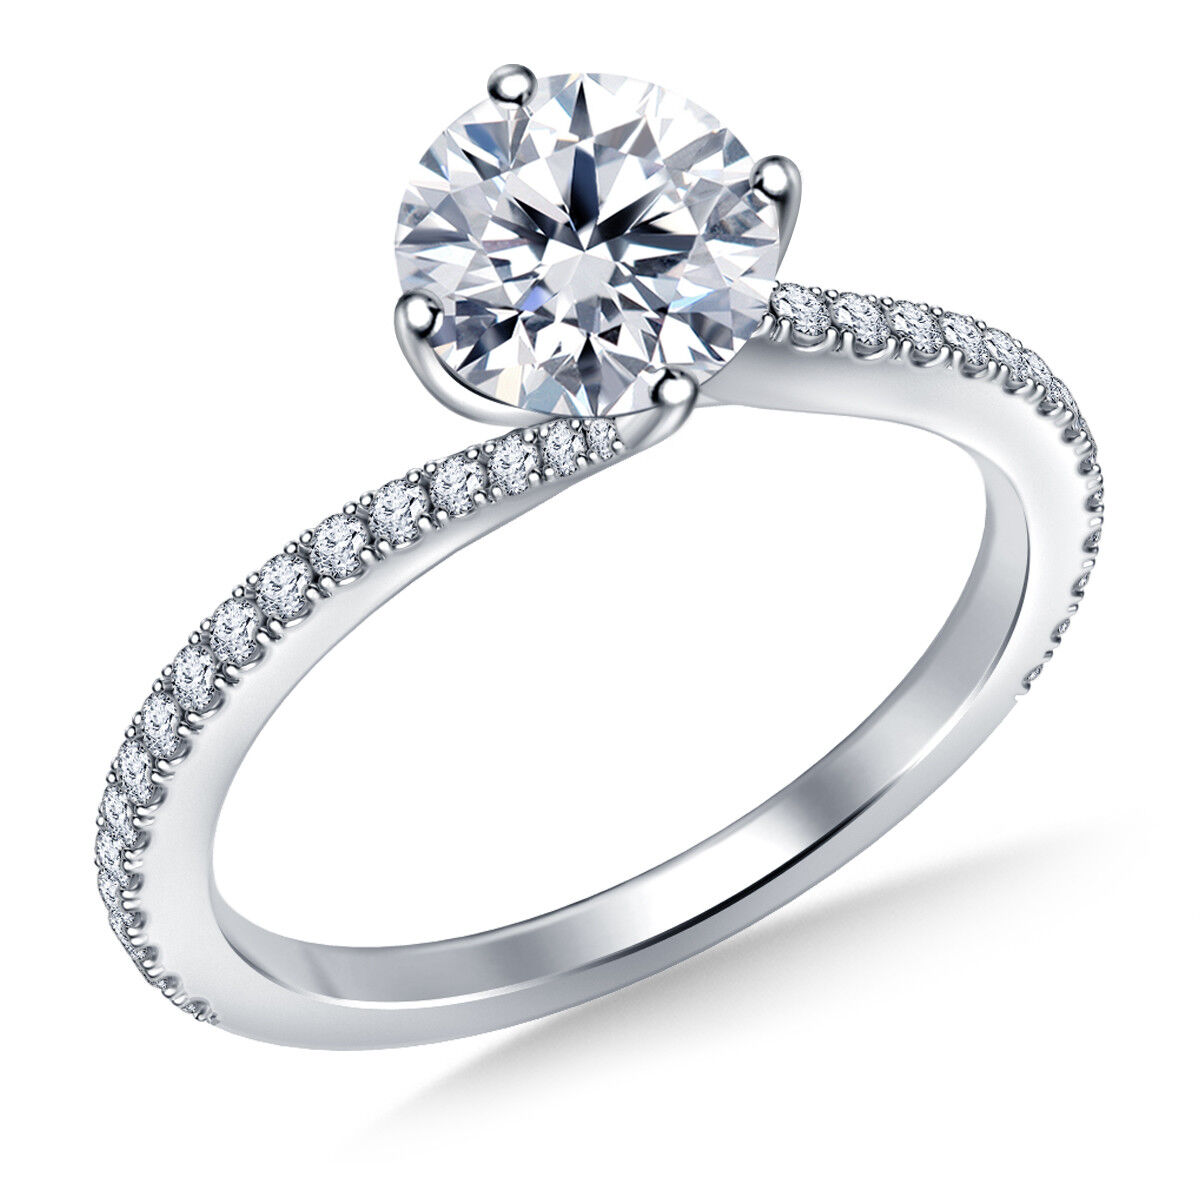 1.00 Ct Bridal Diamond Engagement Ring Hallmarked 18K White Fine gold Size 6 7 8